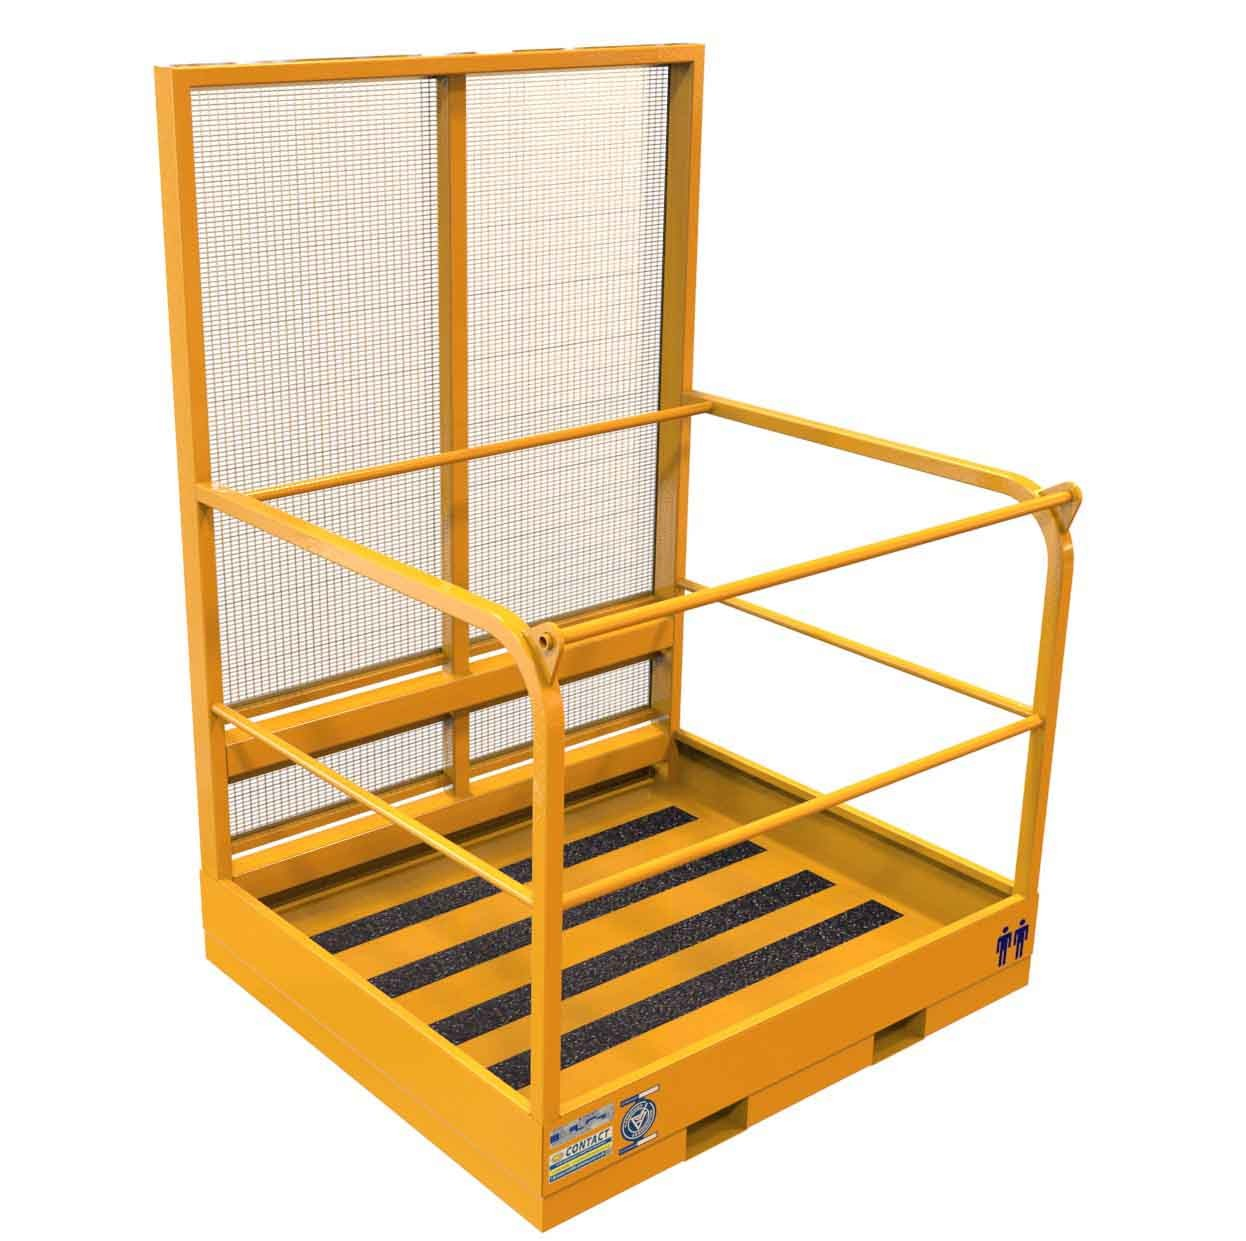 Tele-Handler safety cage